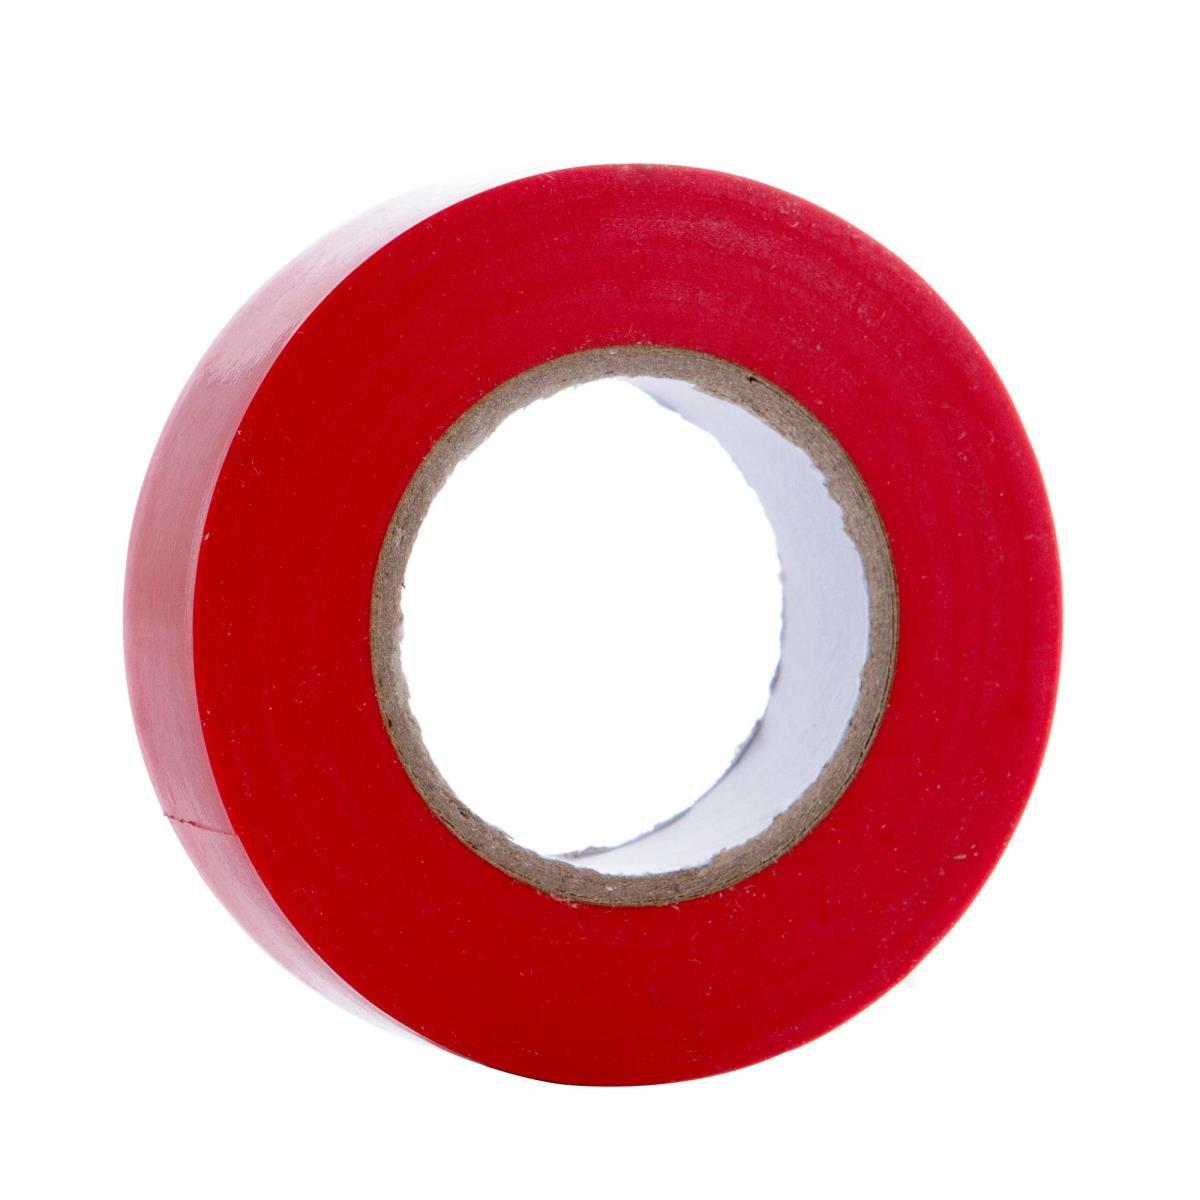 Elektriker Klebeband Isolierband Isoband - Rot 19mm x 20m,OKKO,IZORED20, 4772013050629